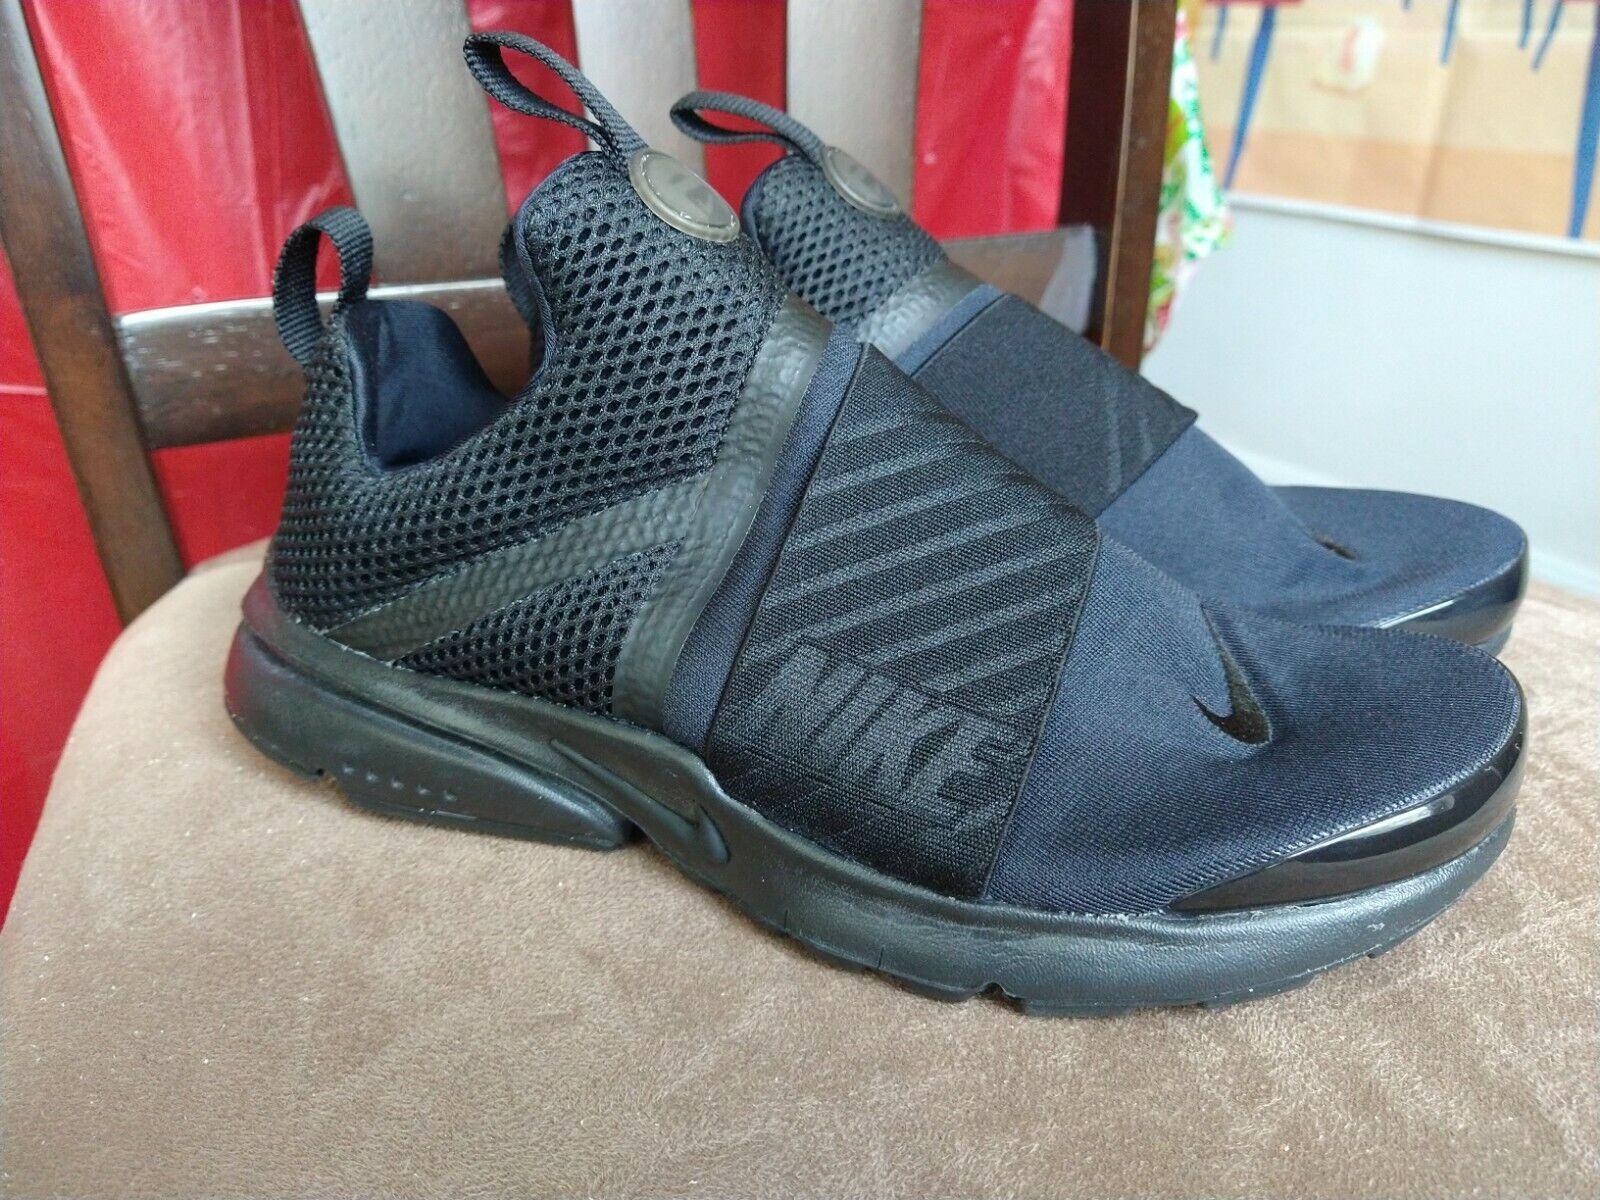 Personas mayores esposas Directamente  Nike Presto Extreme GS Kids Youth Running Shoes White Black 870020-100 UK  4.5 for sale online | eBay